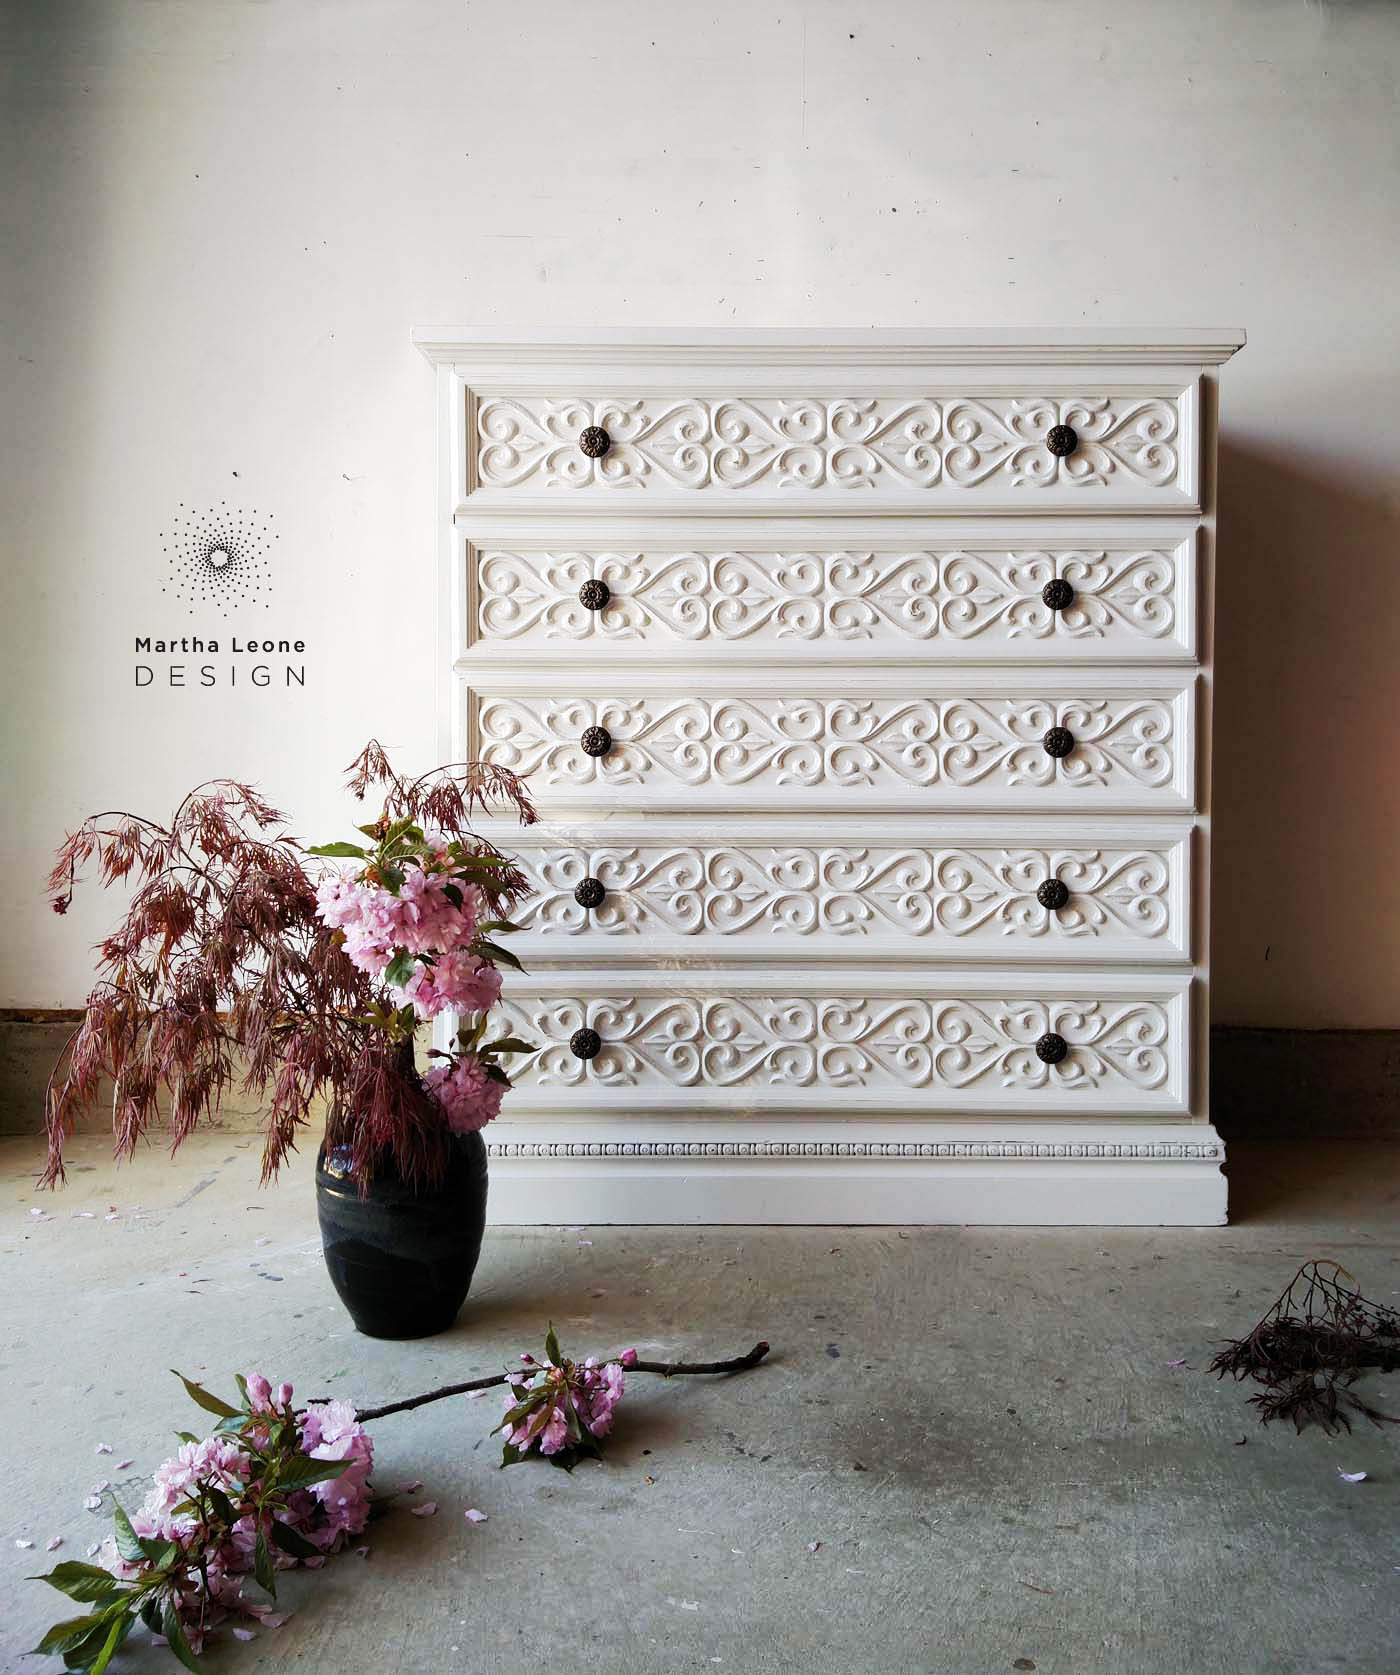 WhiteDresser Martha Leone Design.jpg